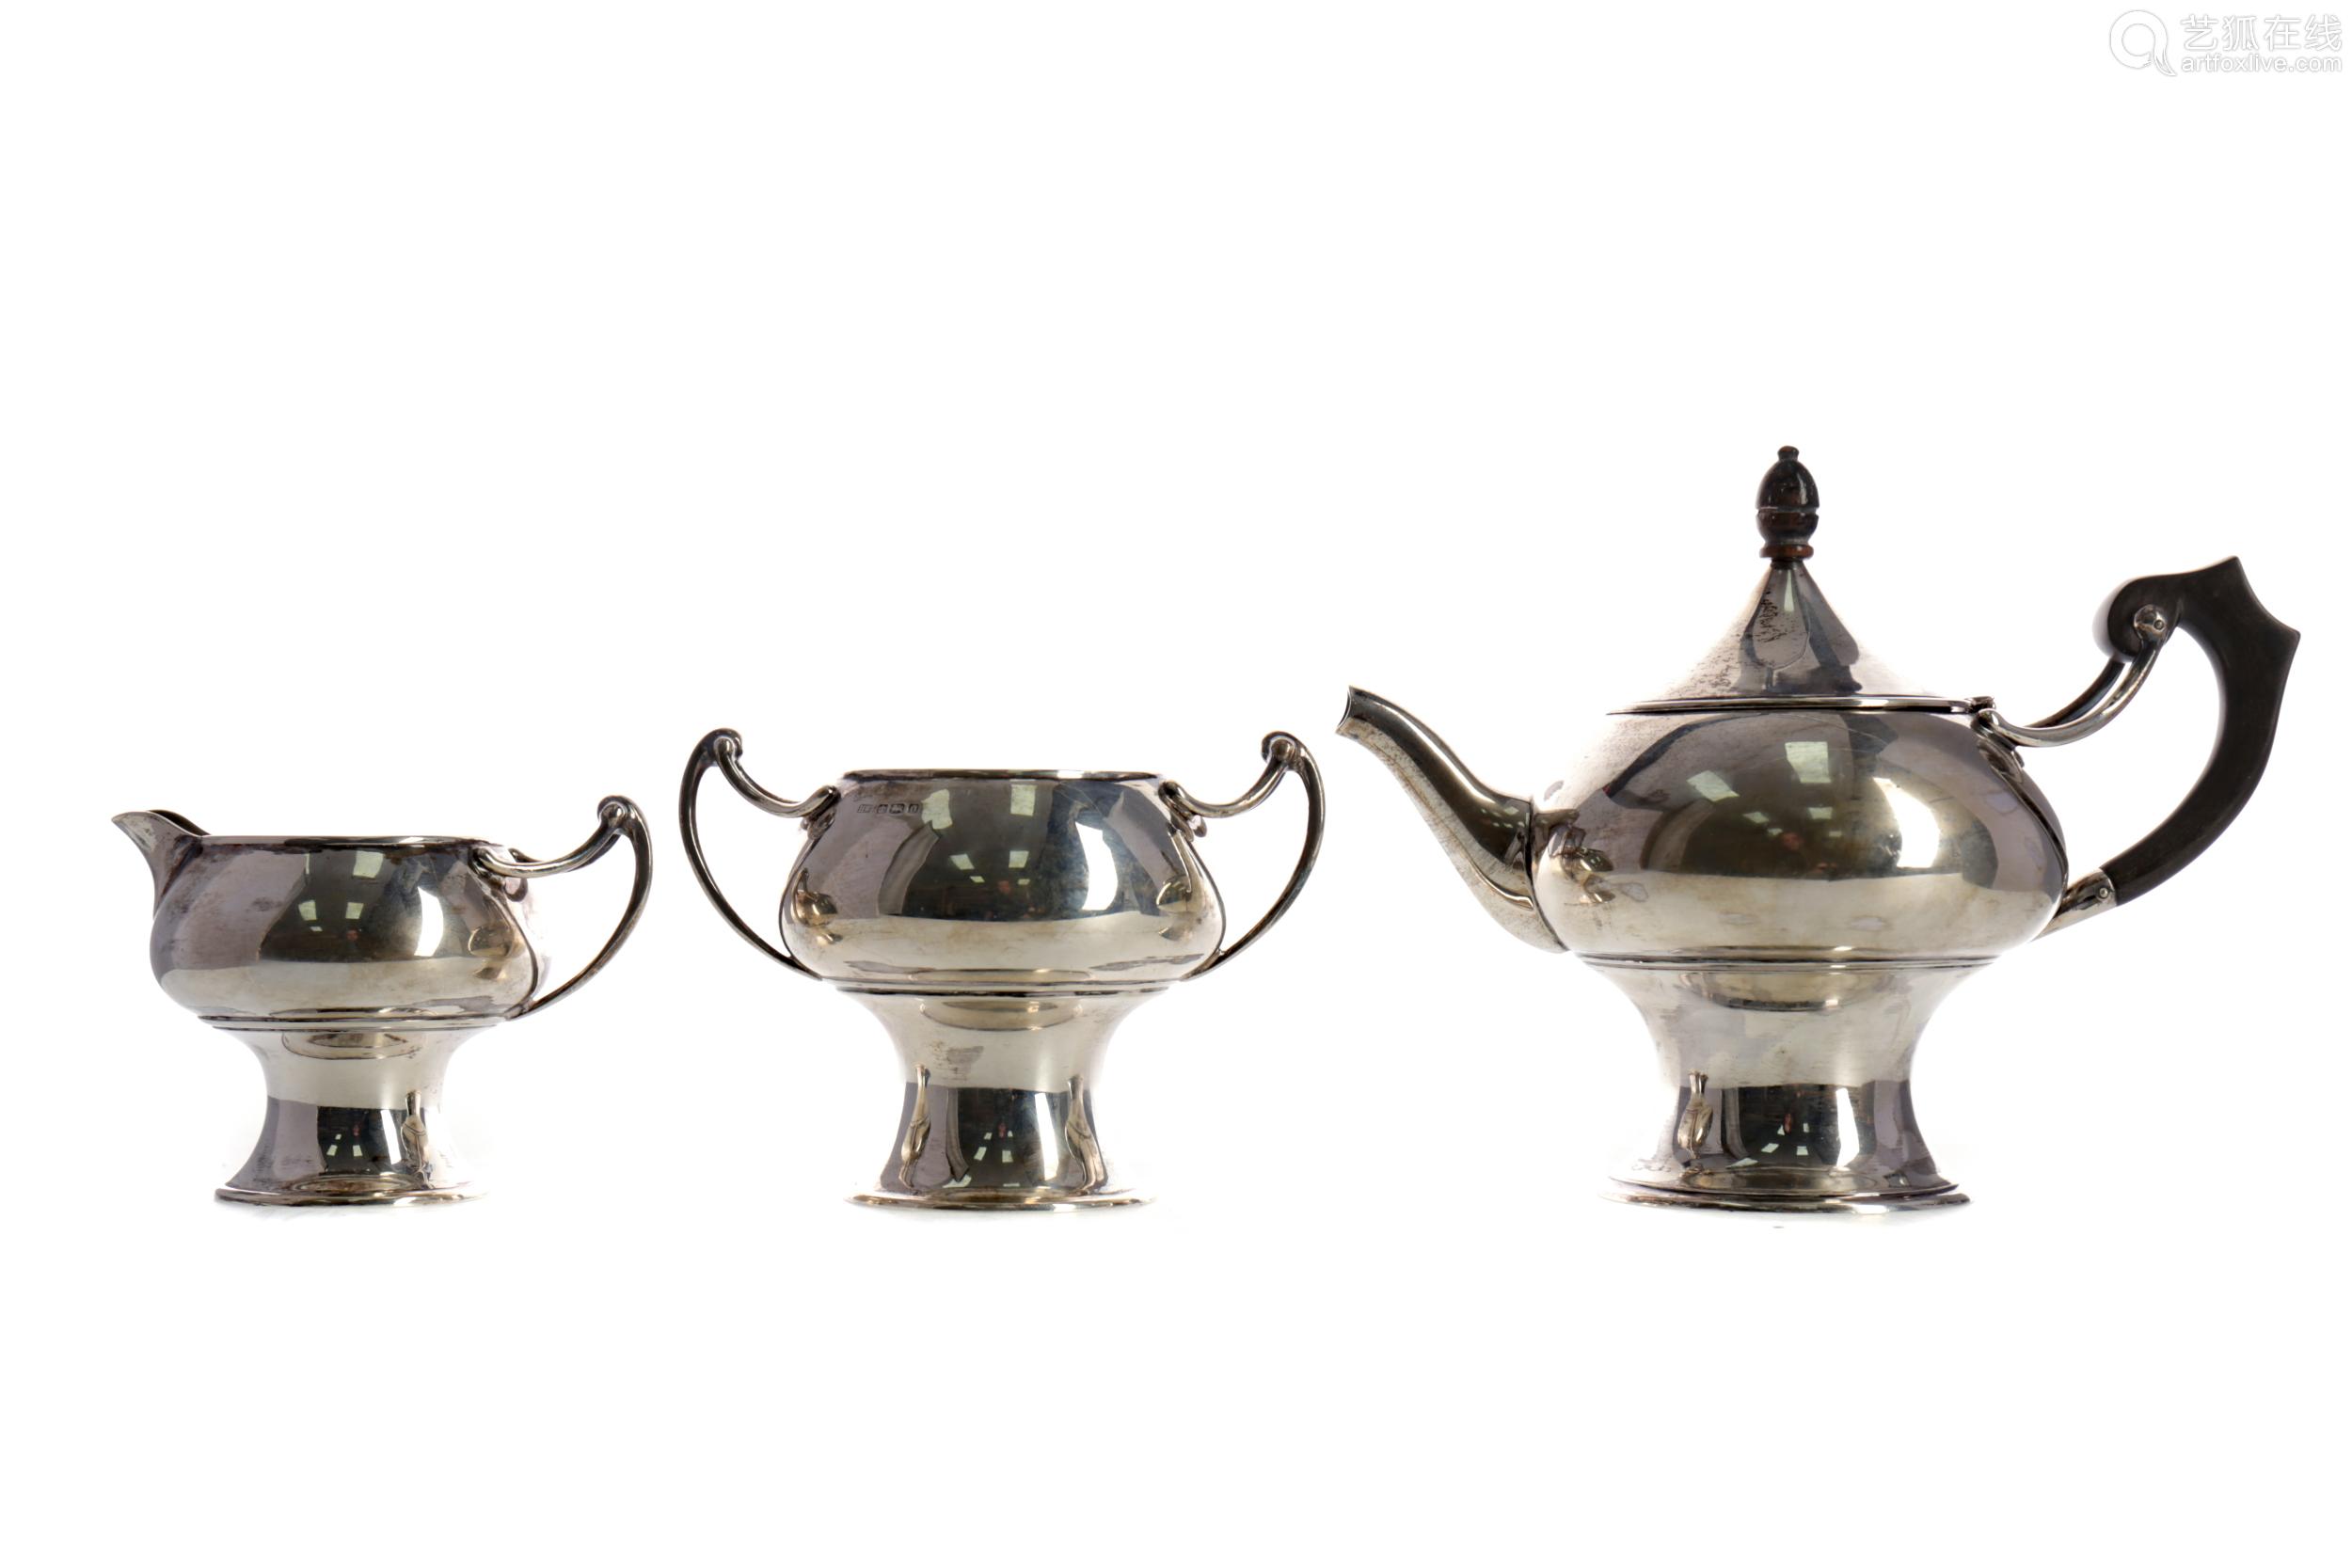 AN EDWARDIAN ART NOUVEAU SILVER BACHELOR'S THREE PIECE TEA S...